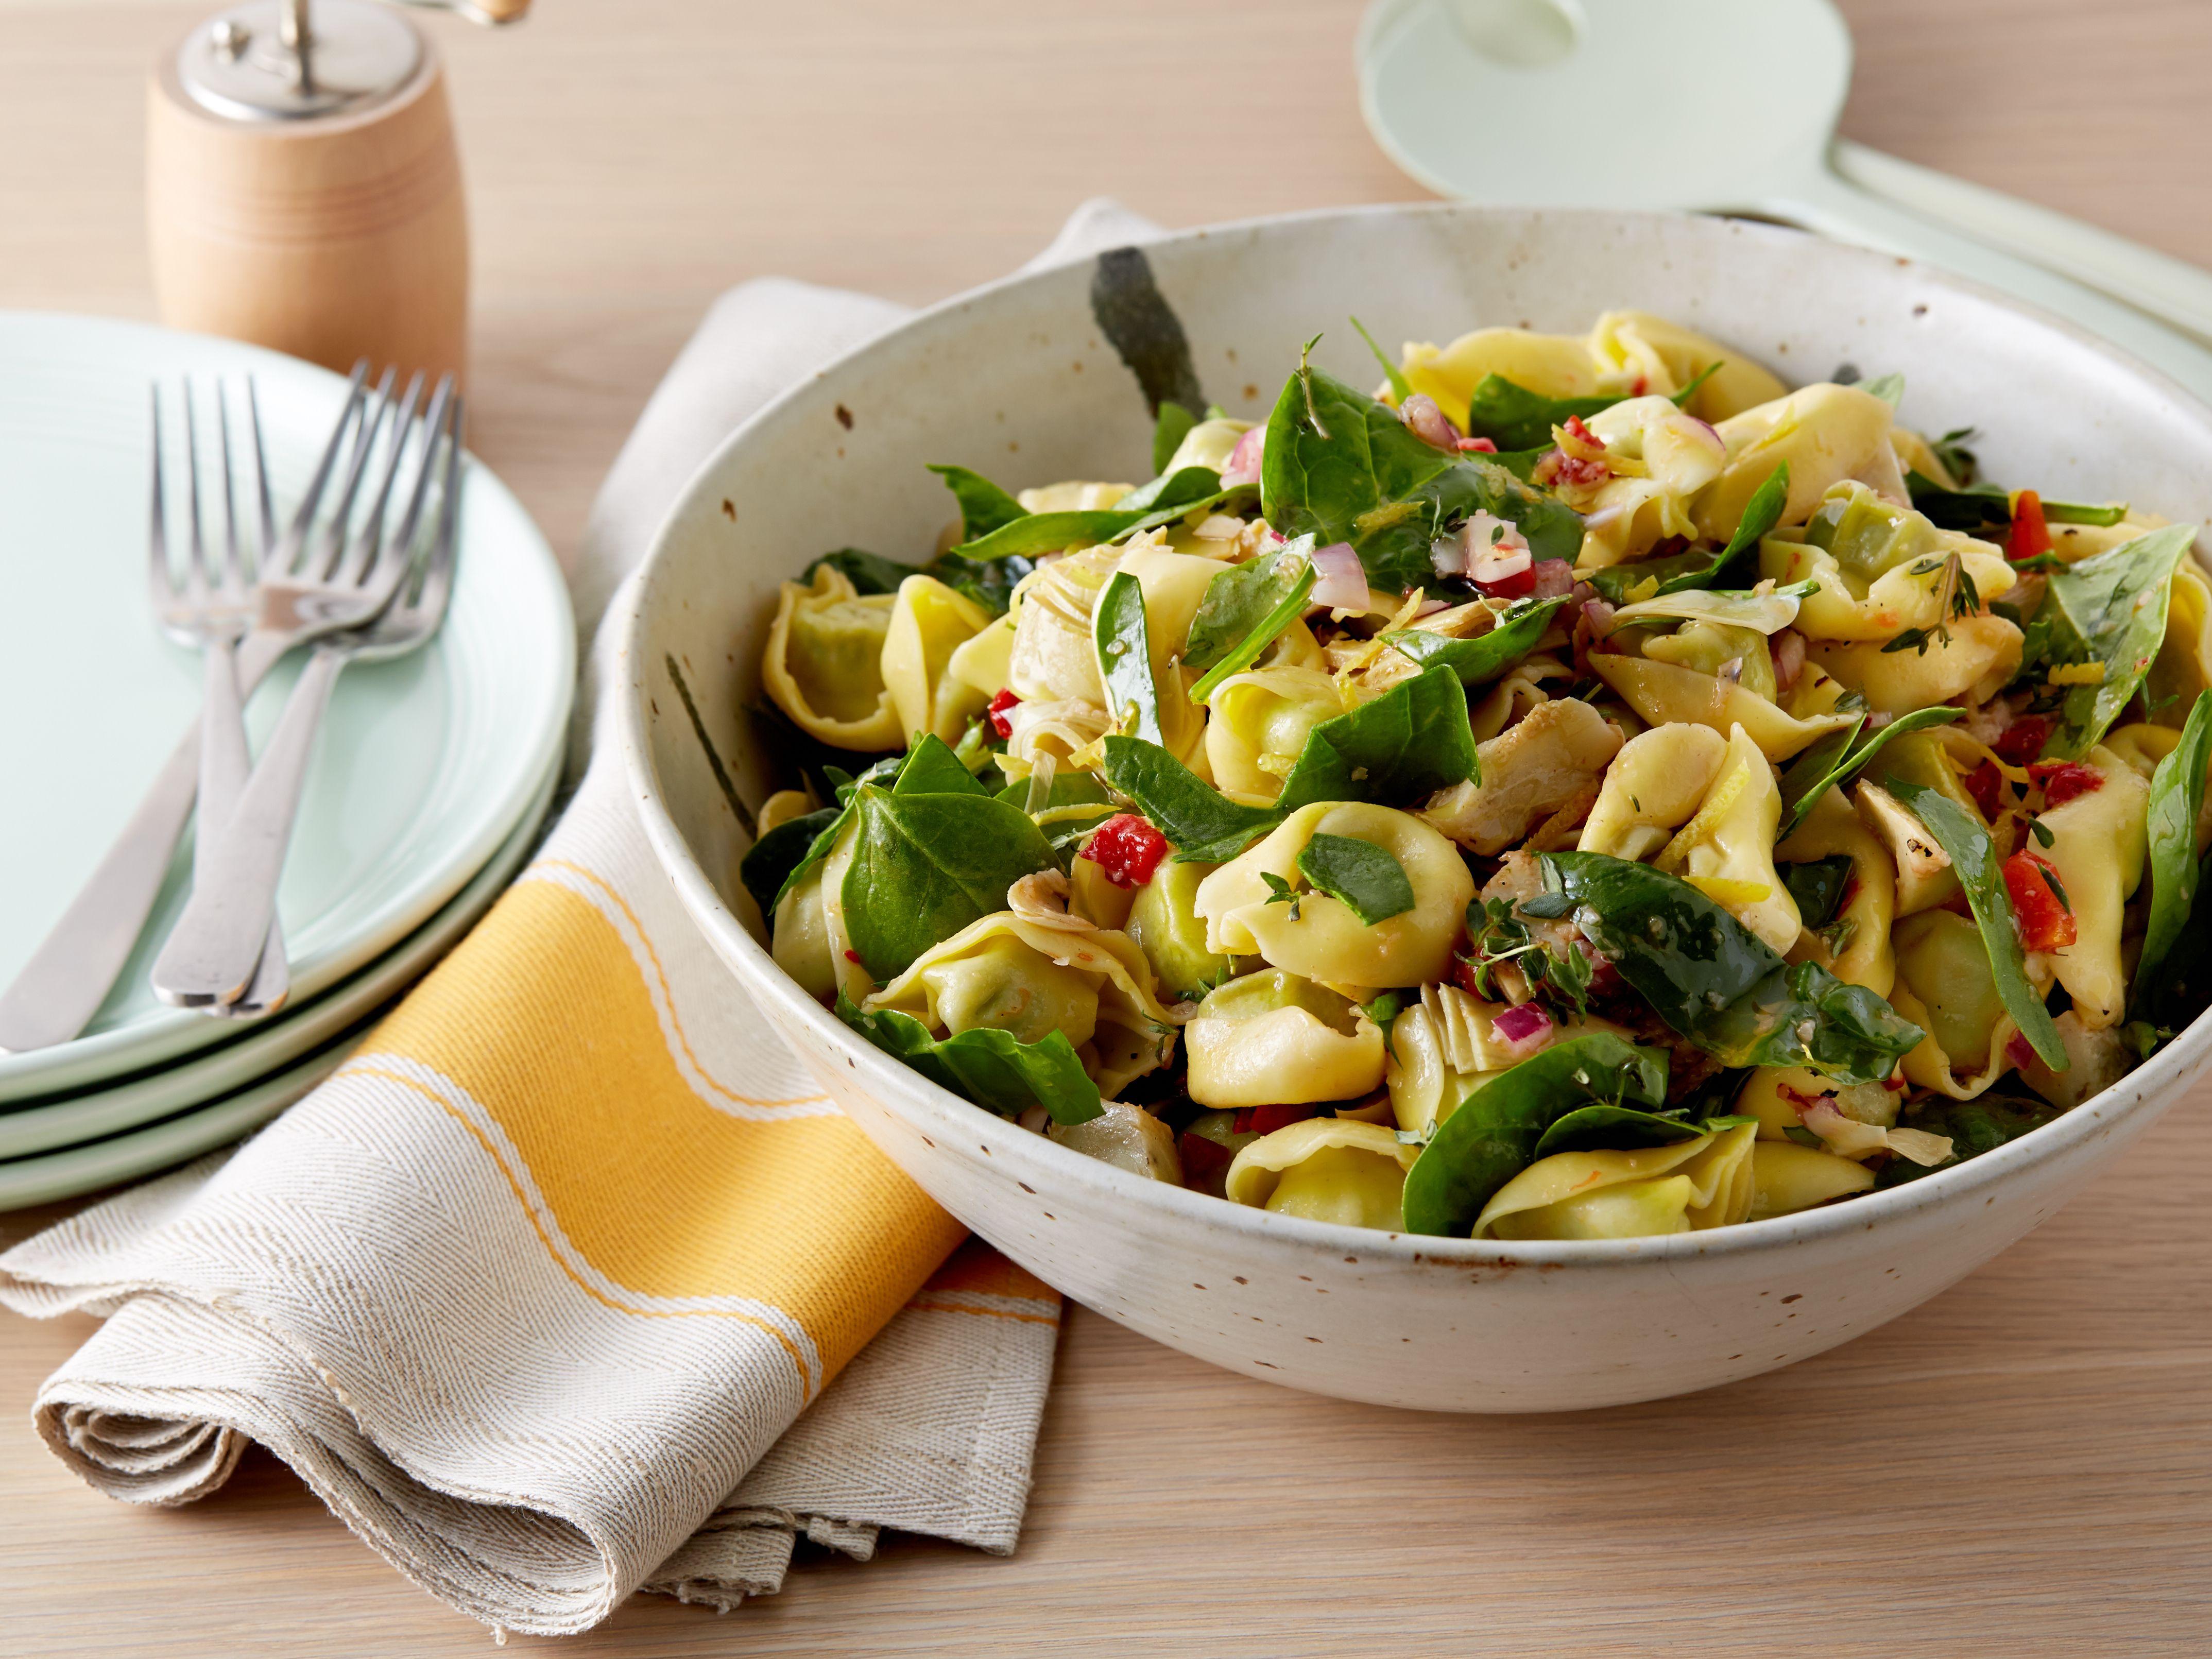 Spinach Artichoke Pasta Salad recipe from Rachael Ray via Food Network